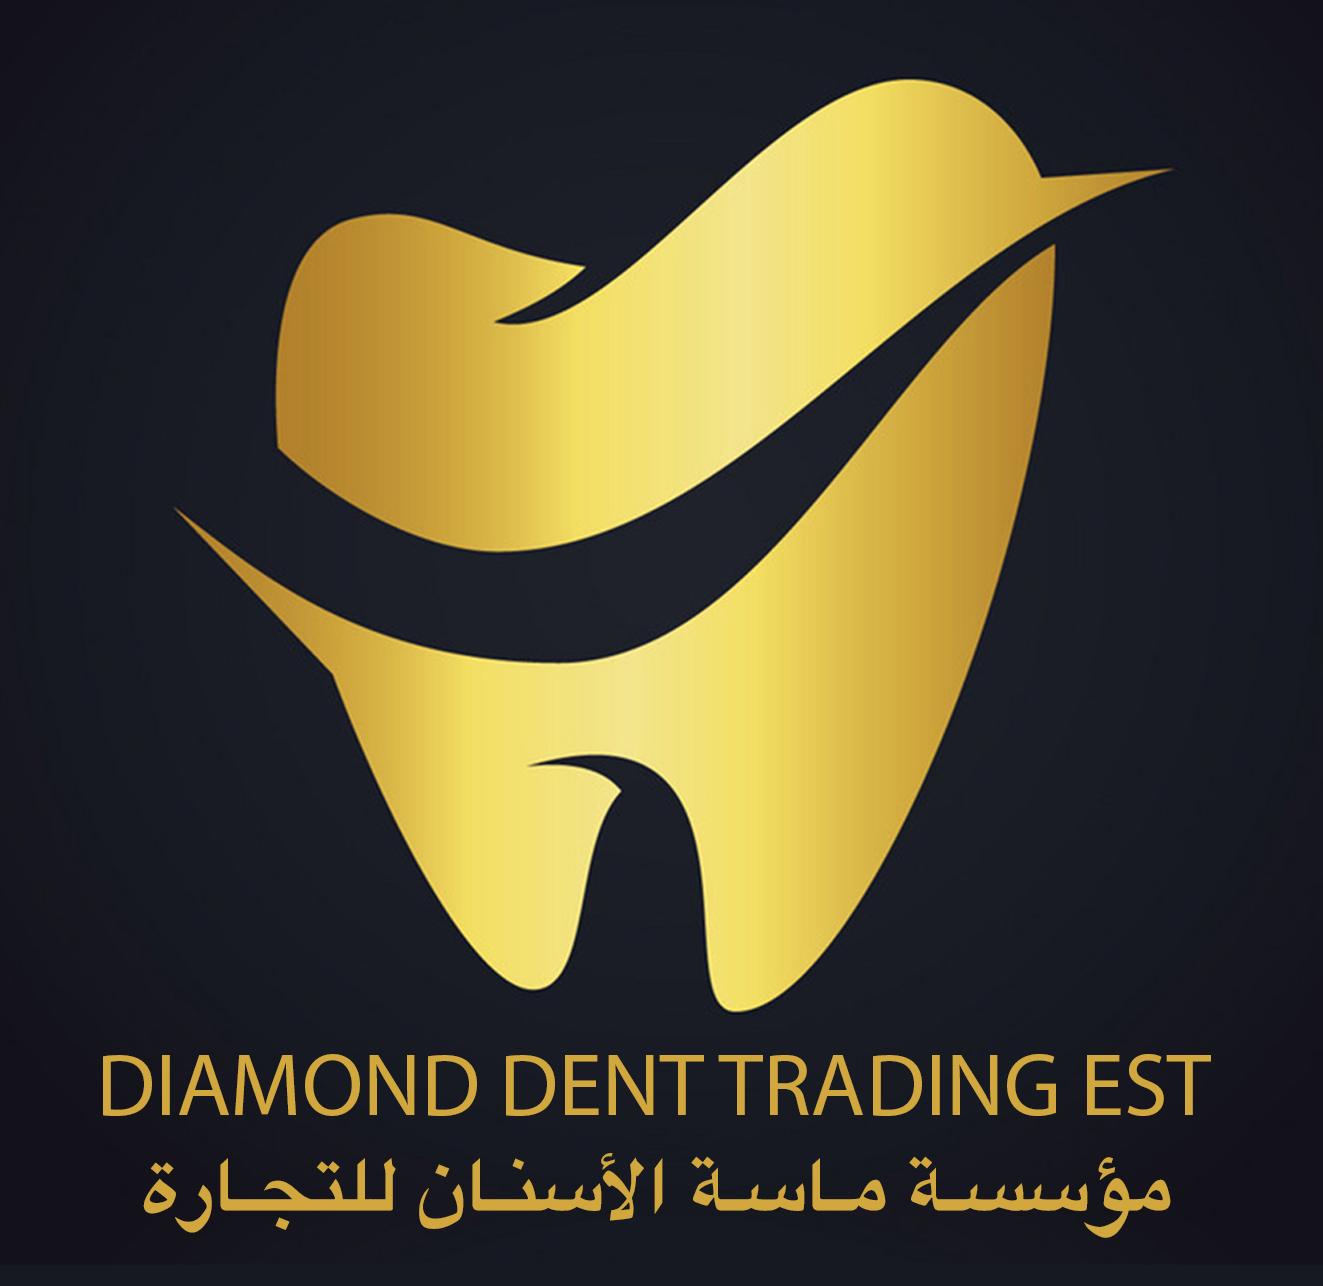 Diamond Dent Trading EST